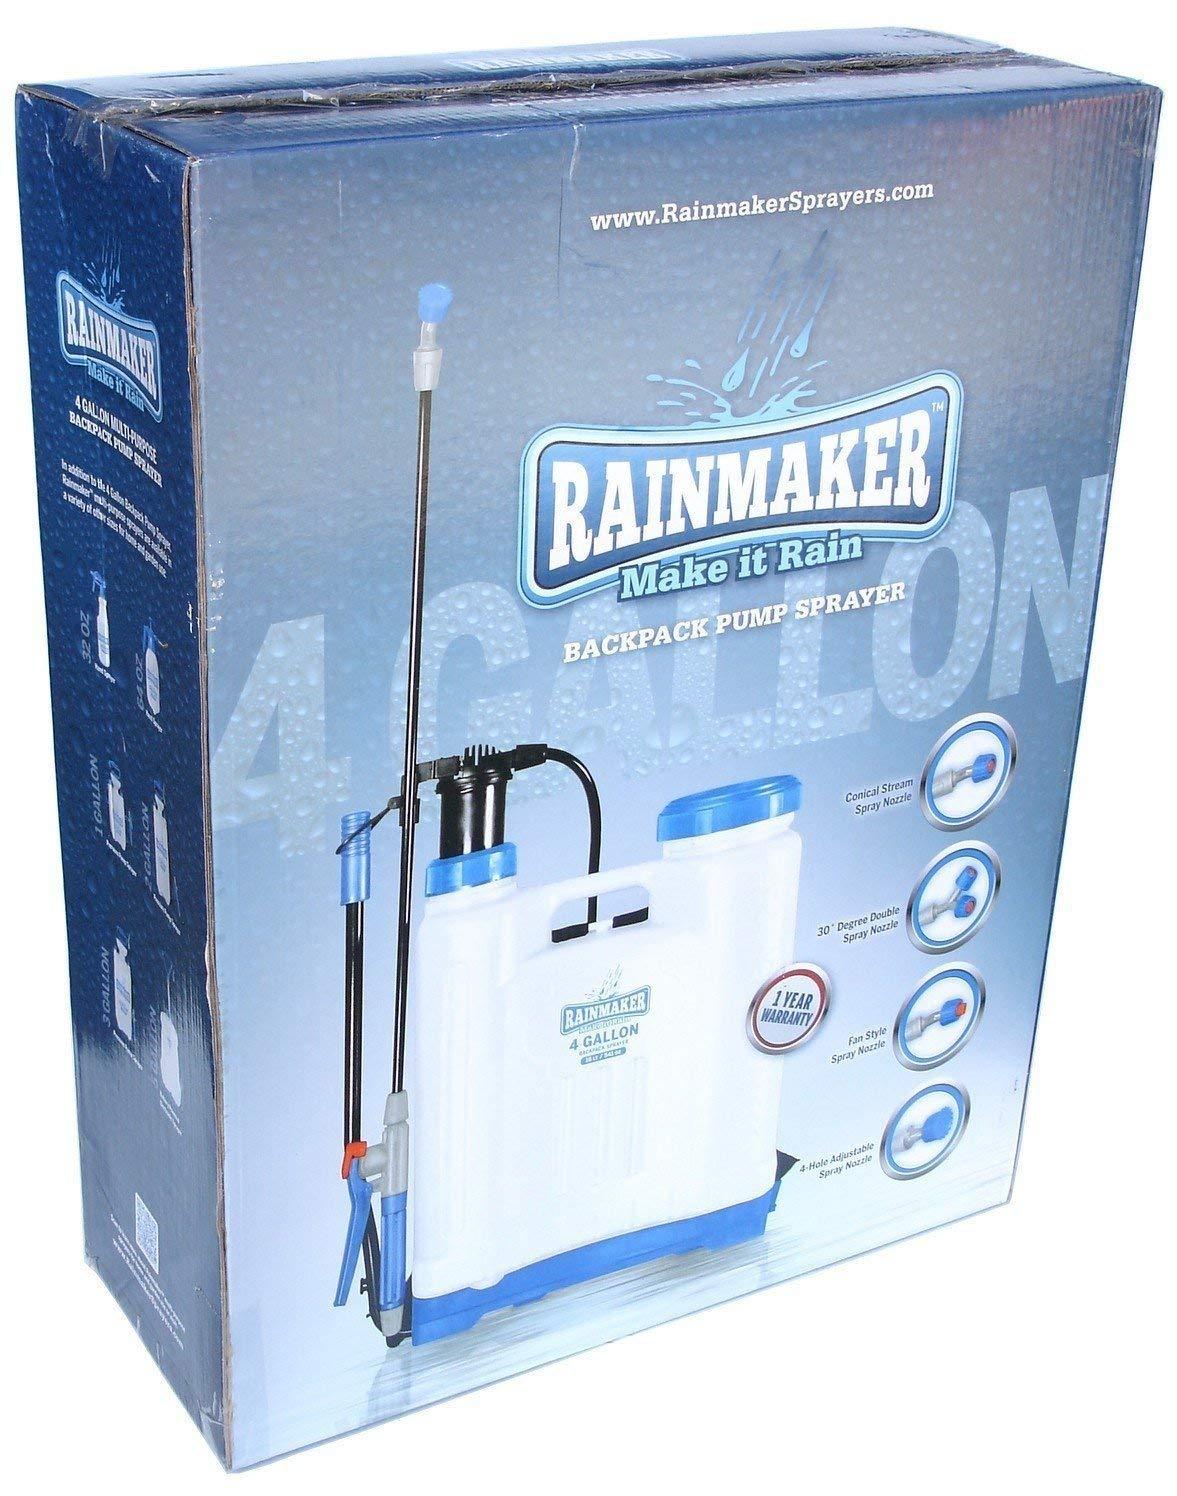 Rainmaker Backpack 4-Gallon Sprayer